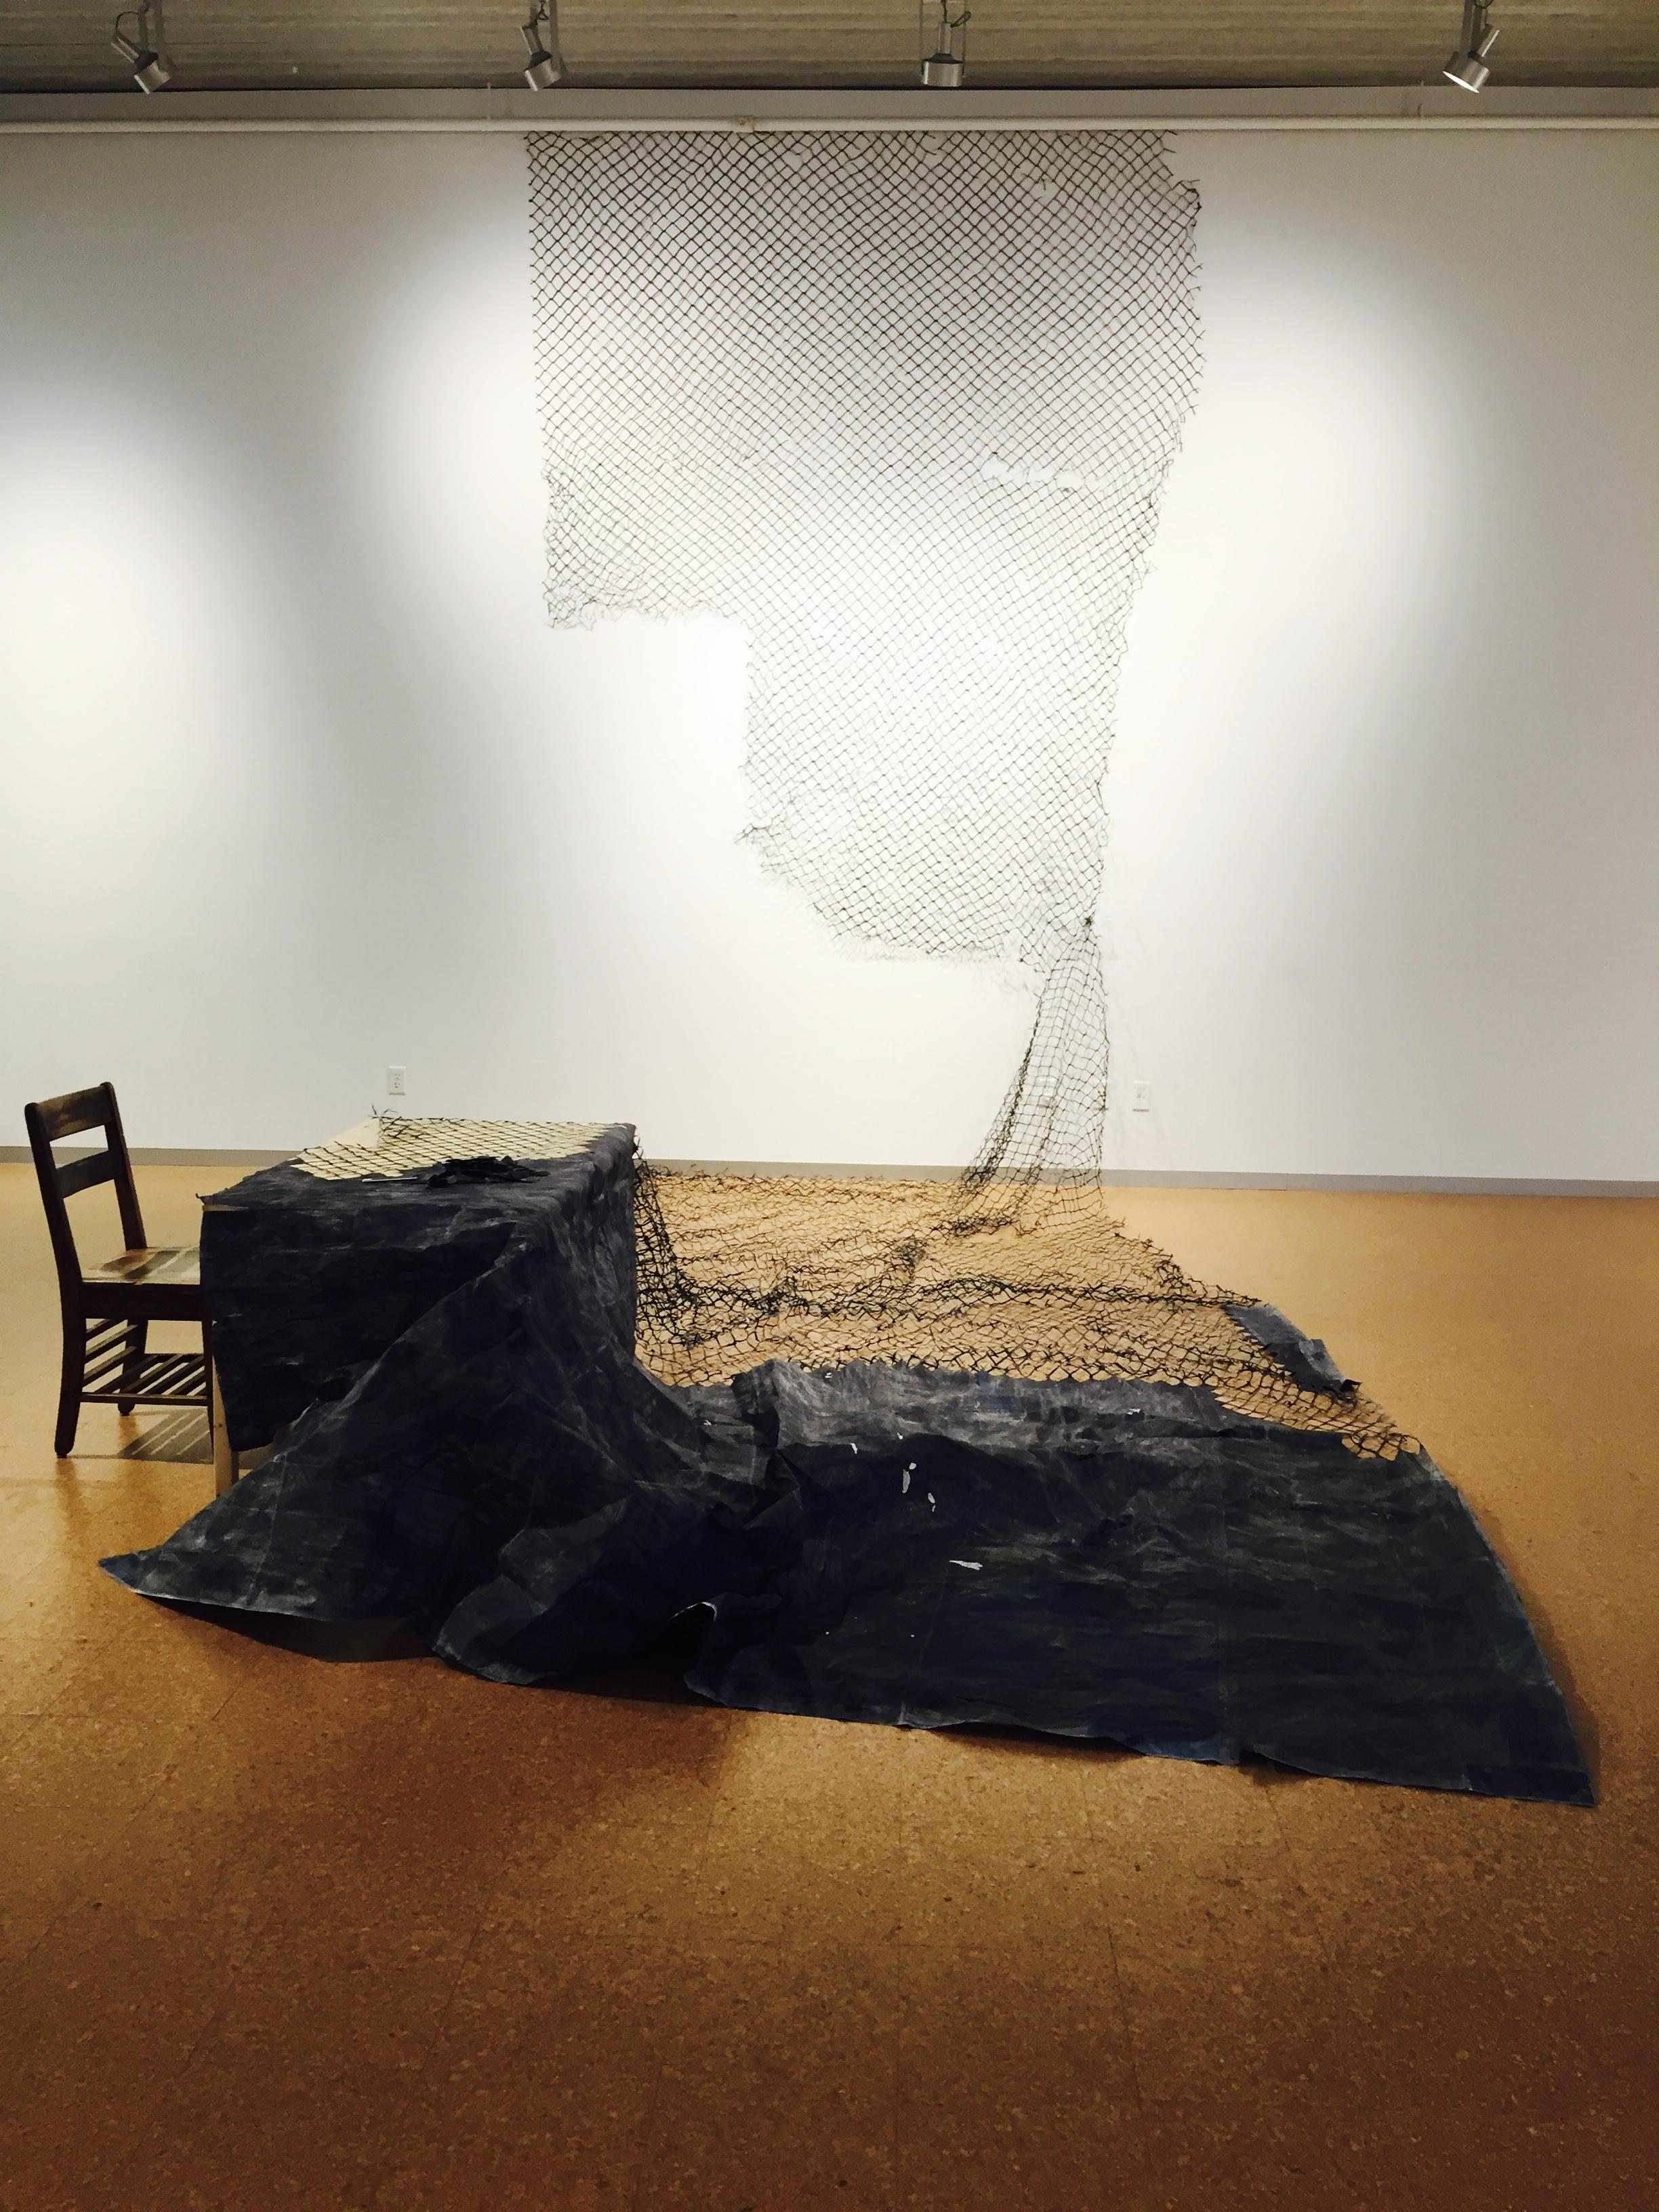 Veil  Levitt Gallery Iowa City, IA